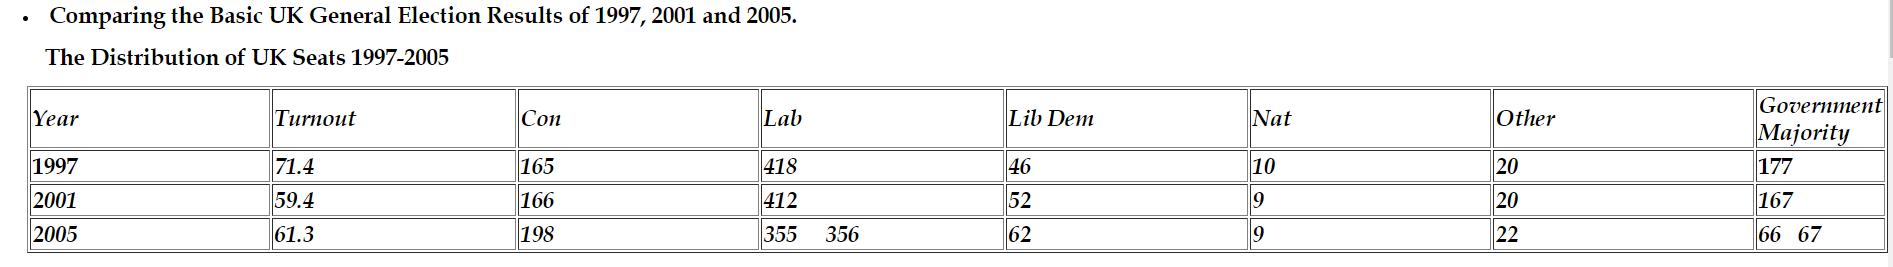 Distribution of UK Seats 97-05